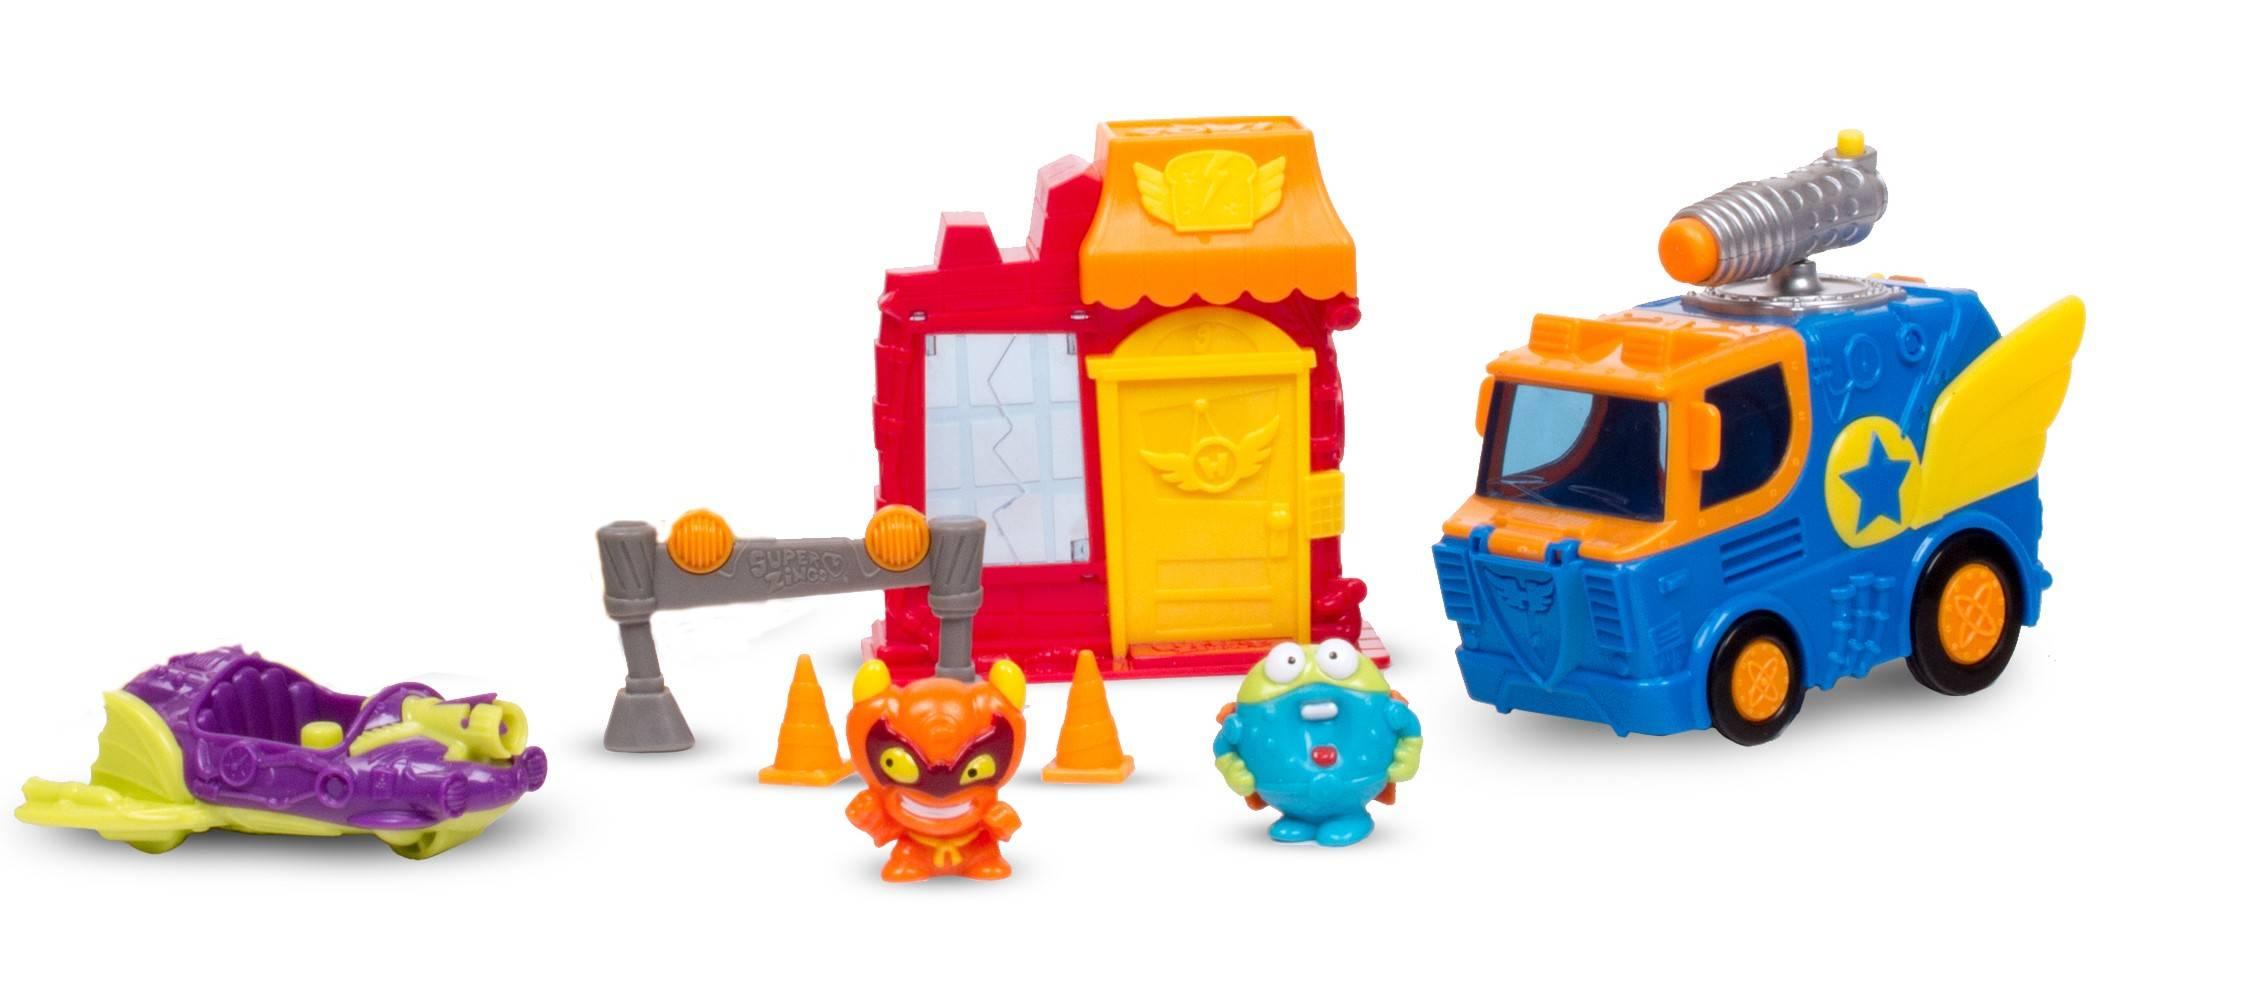 Super Zings mission bakery blast zestaw figurki pojazdy